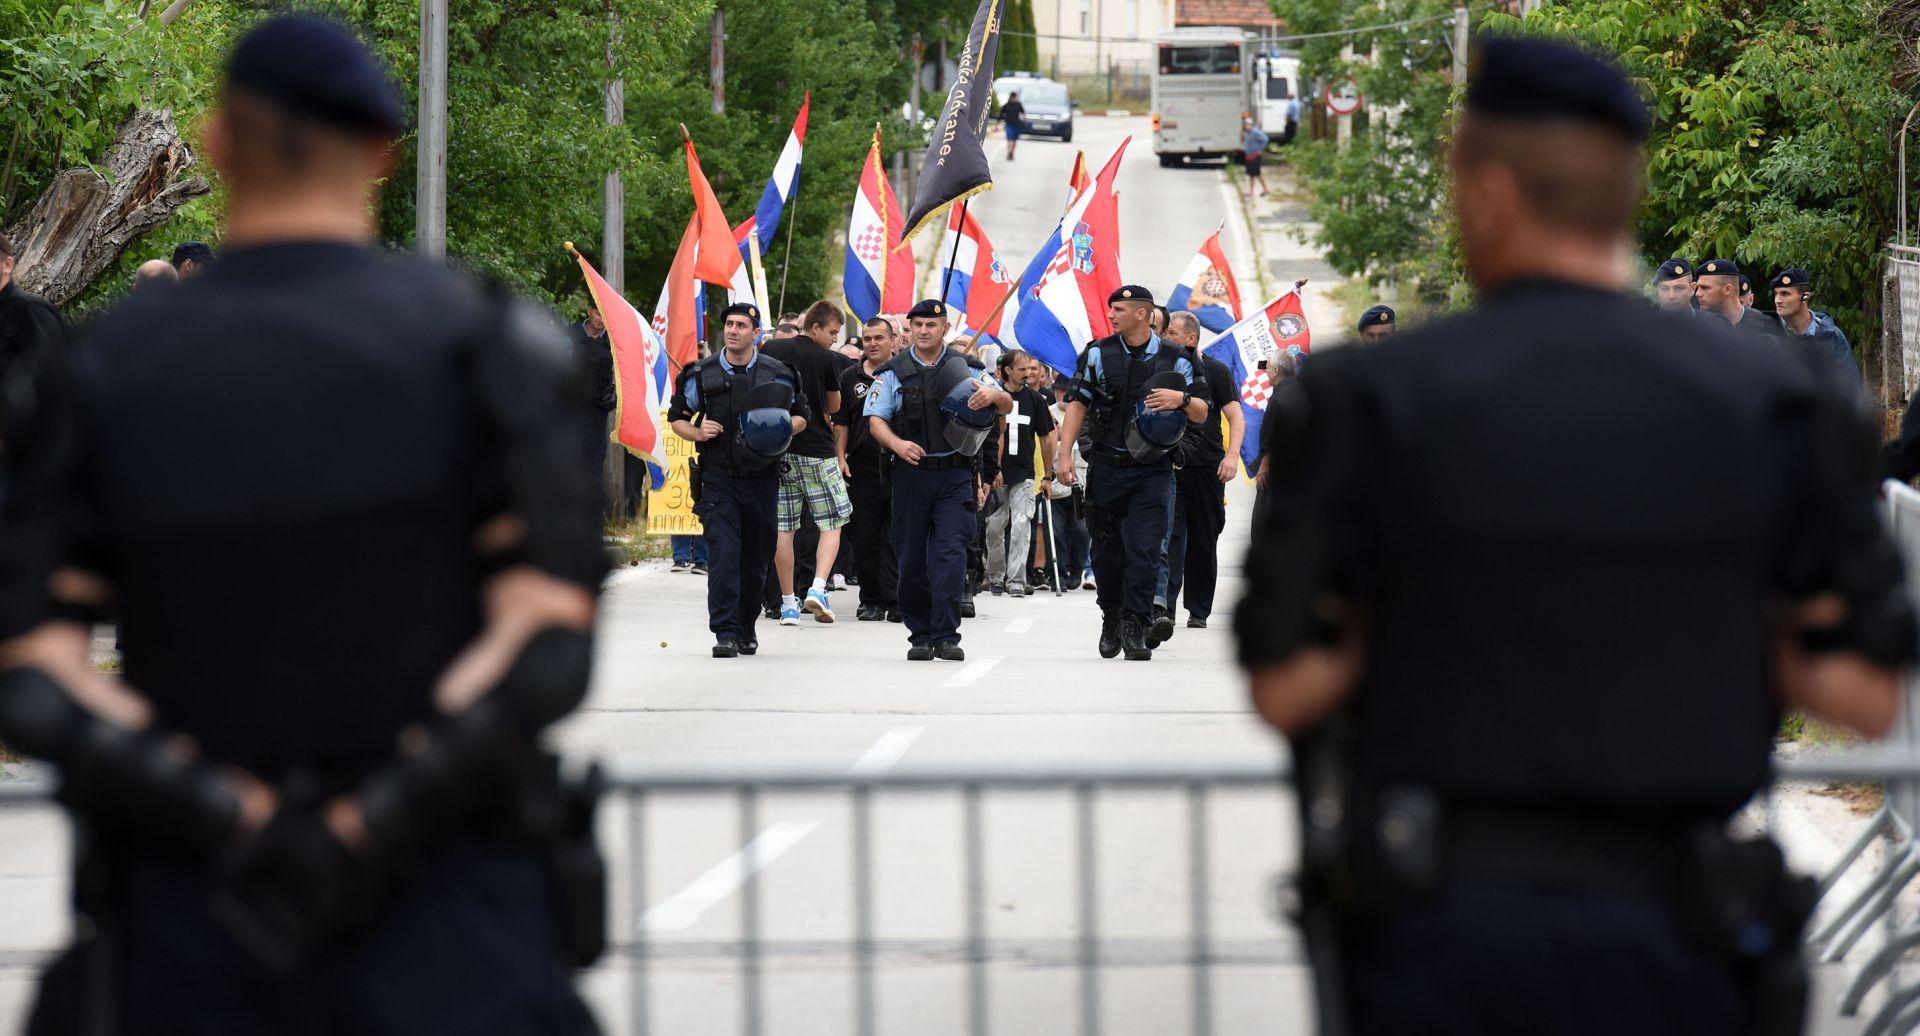 DAN USTANKA NARODA LIKE: U Srbu obilježen pokret otpora i ustanak protiv okupatora